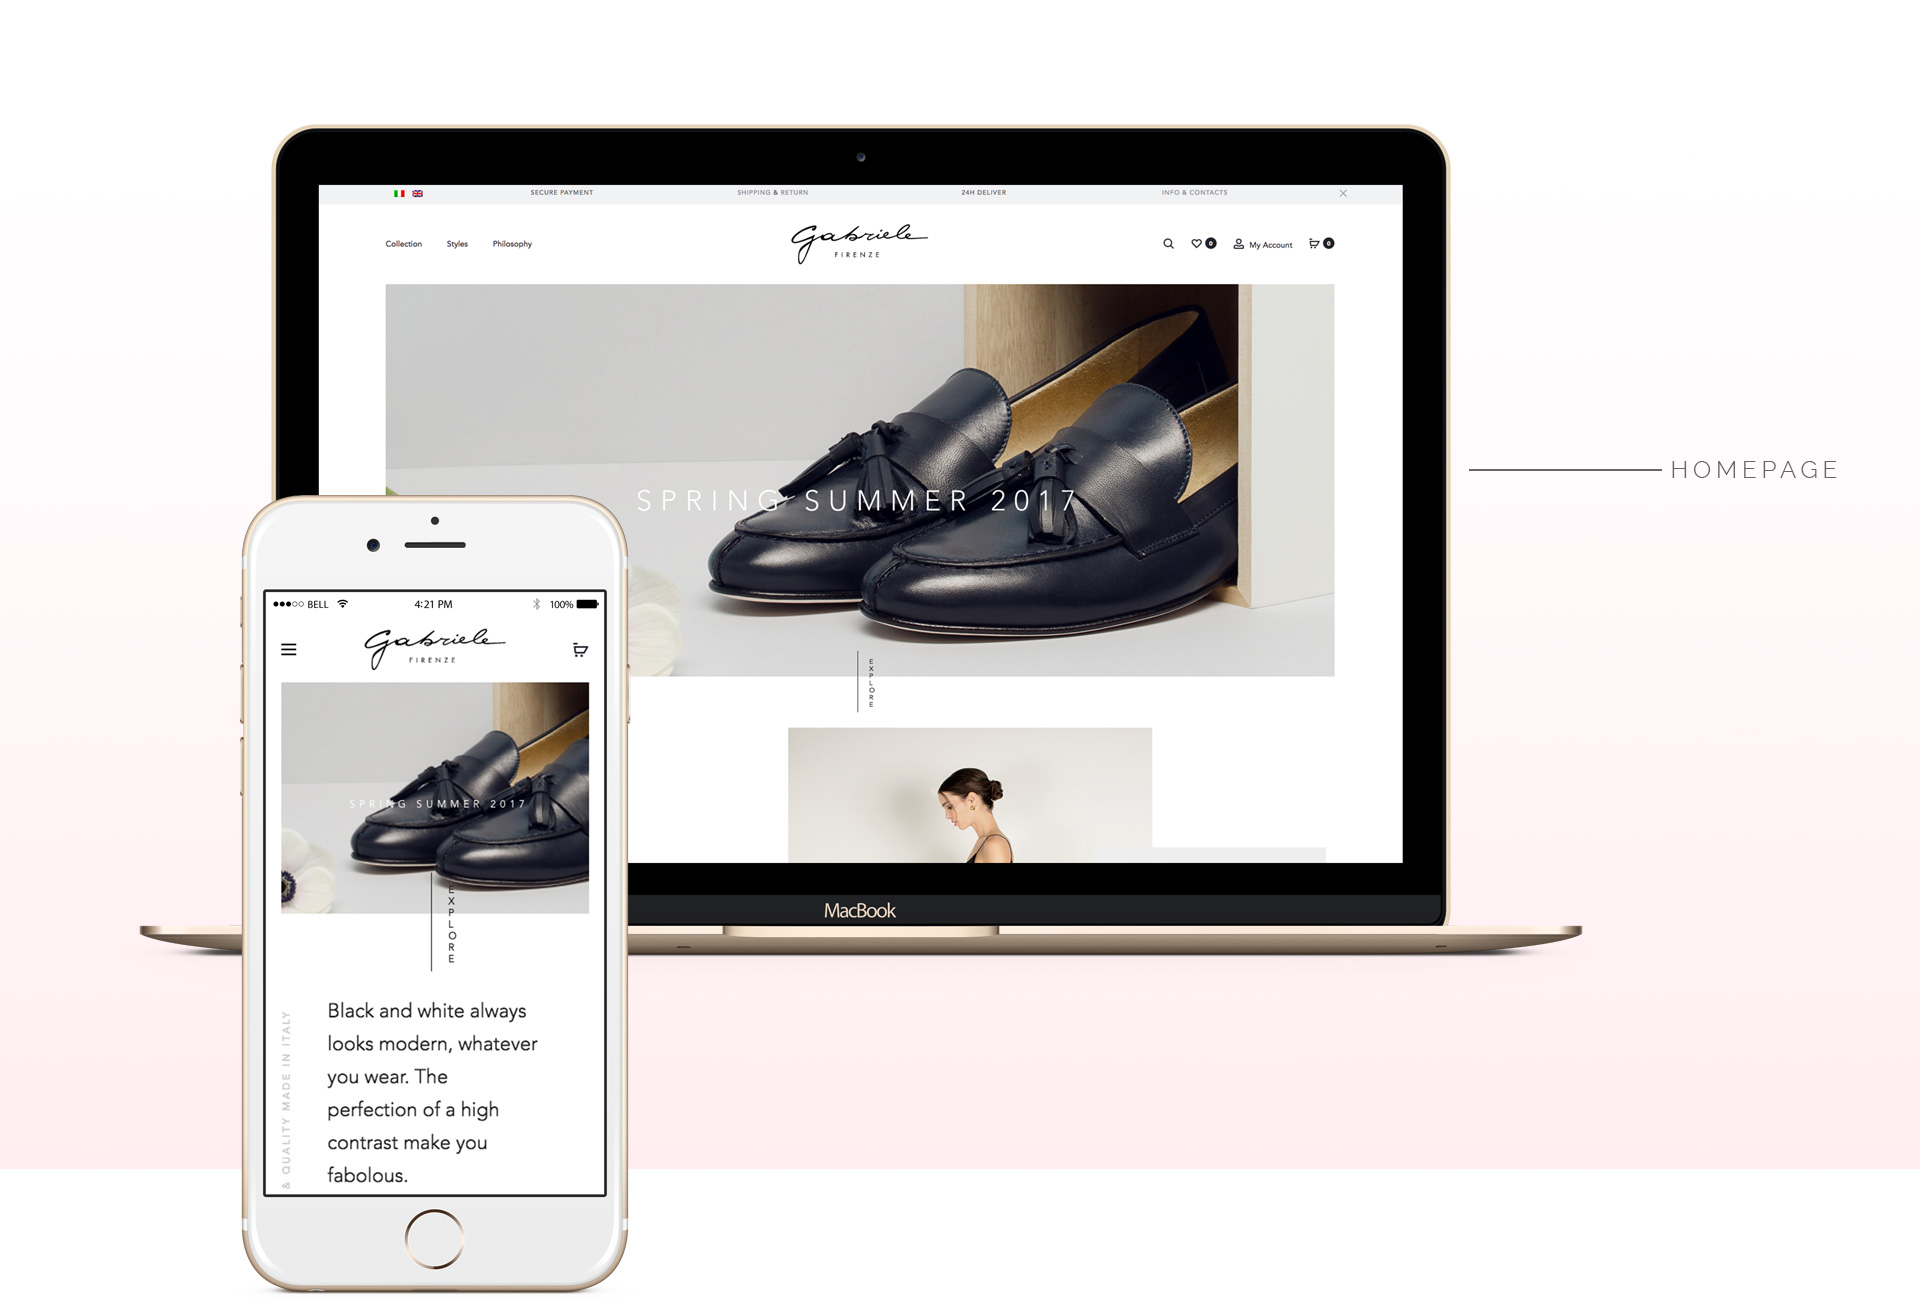 homepage-gabriele-firenze-shoes